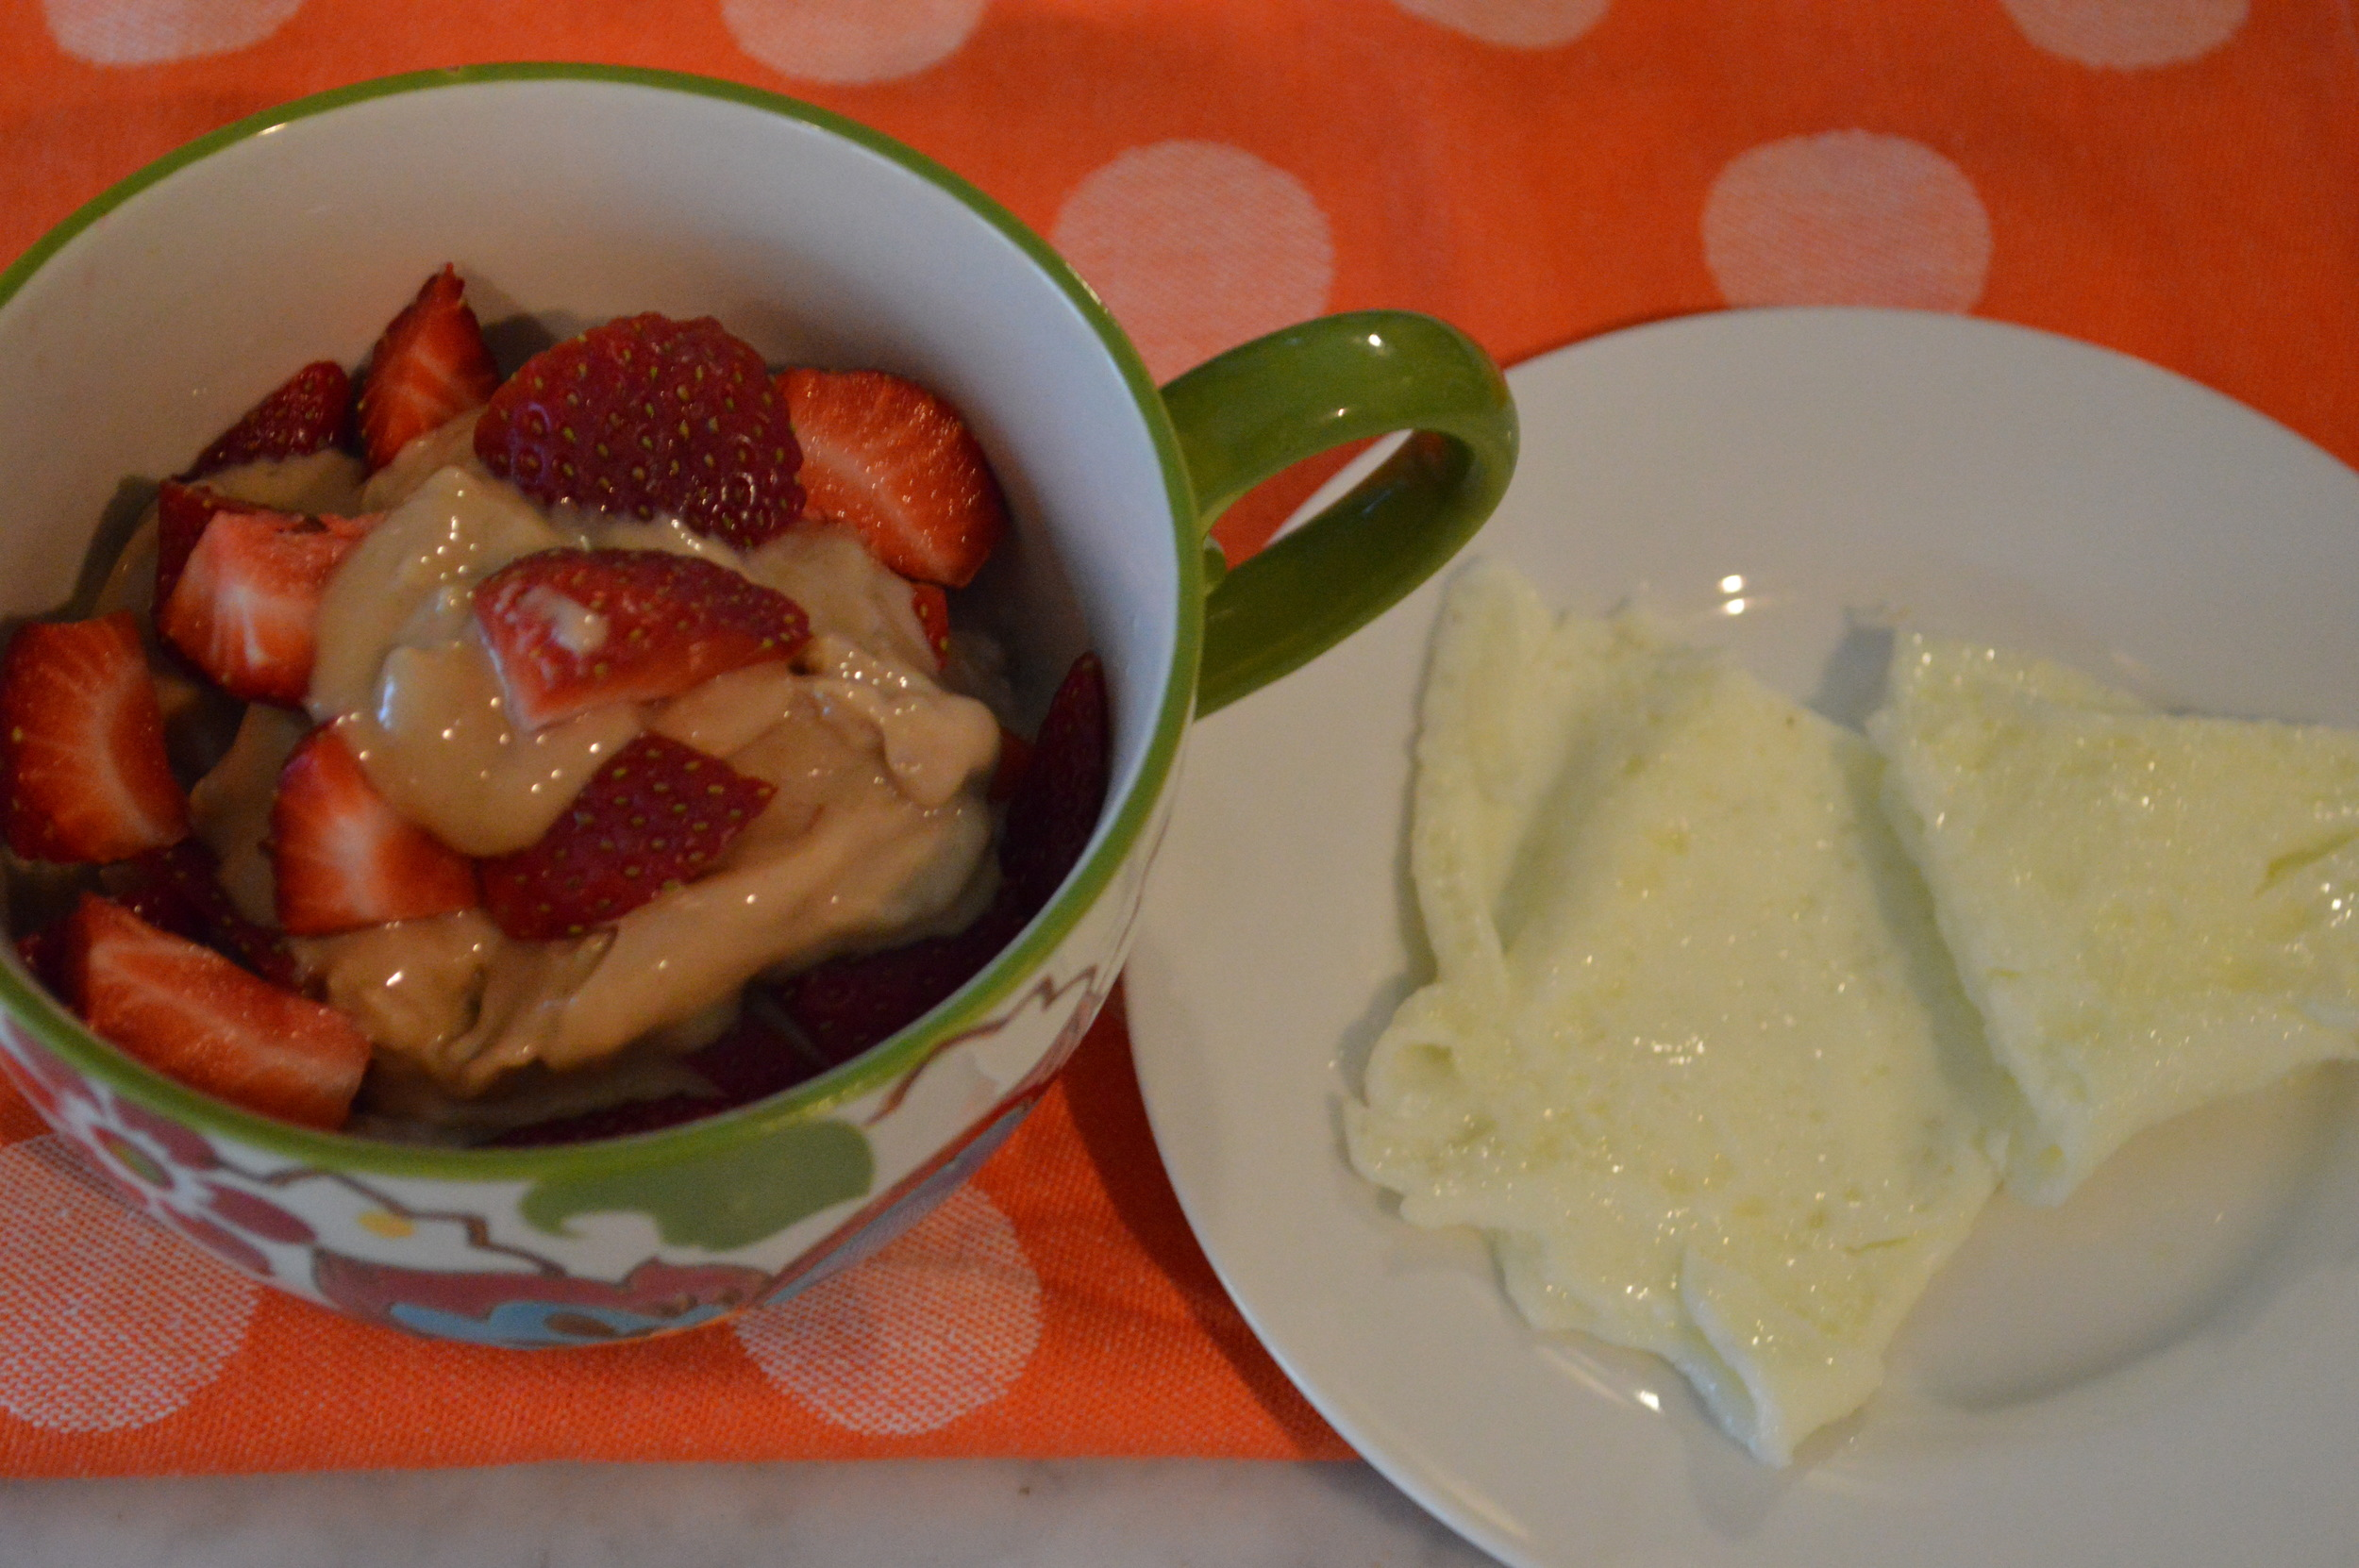 Strawberry + Peanut Butter Oatmeal